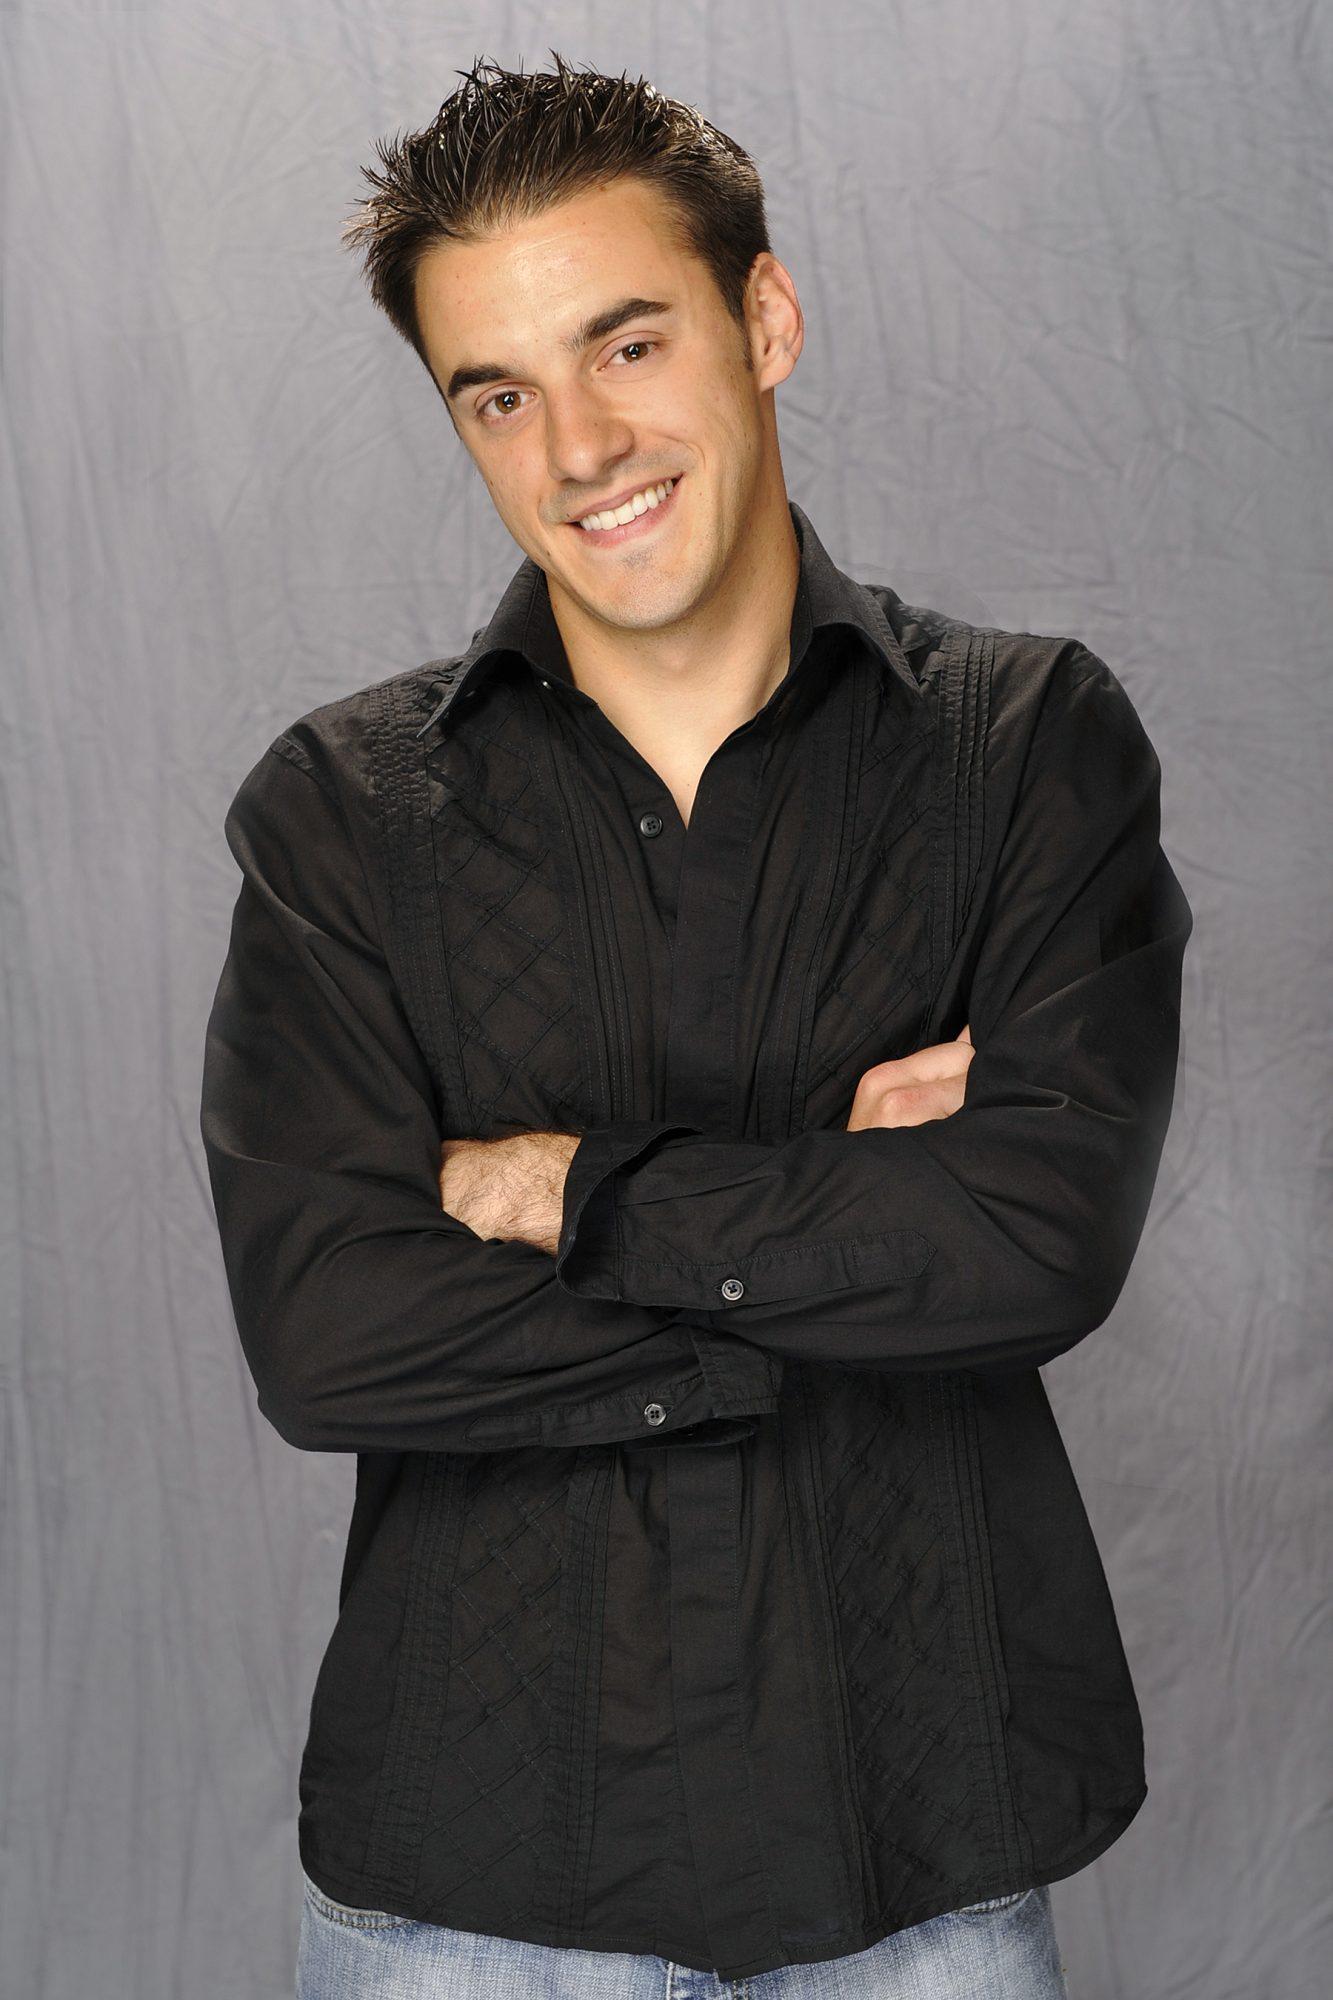 3. Dan Gheesling (Season 10)